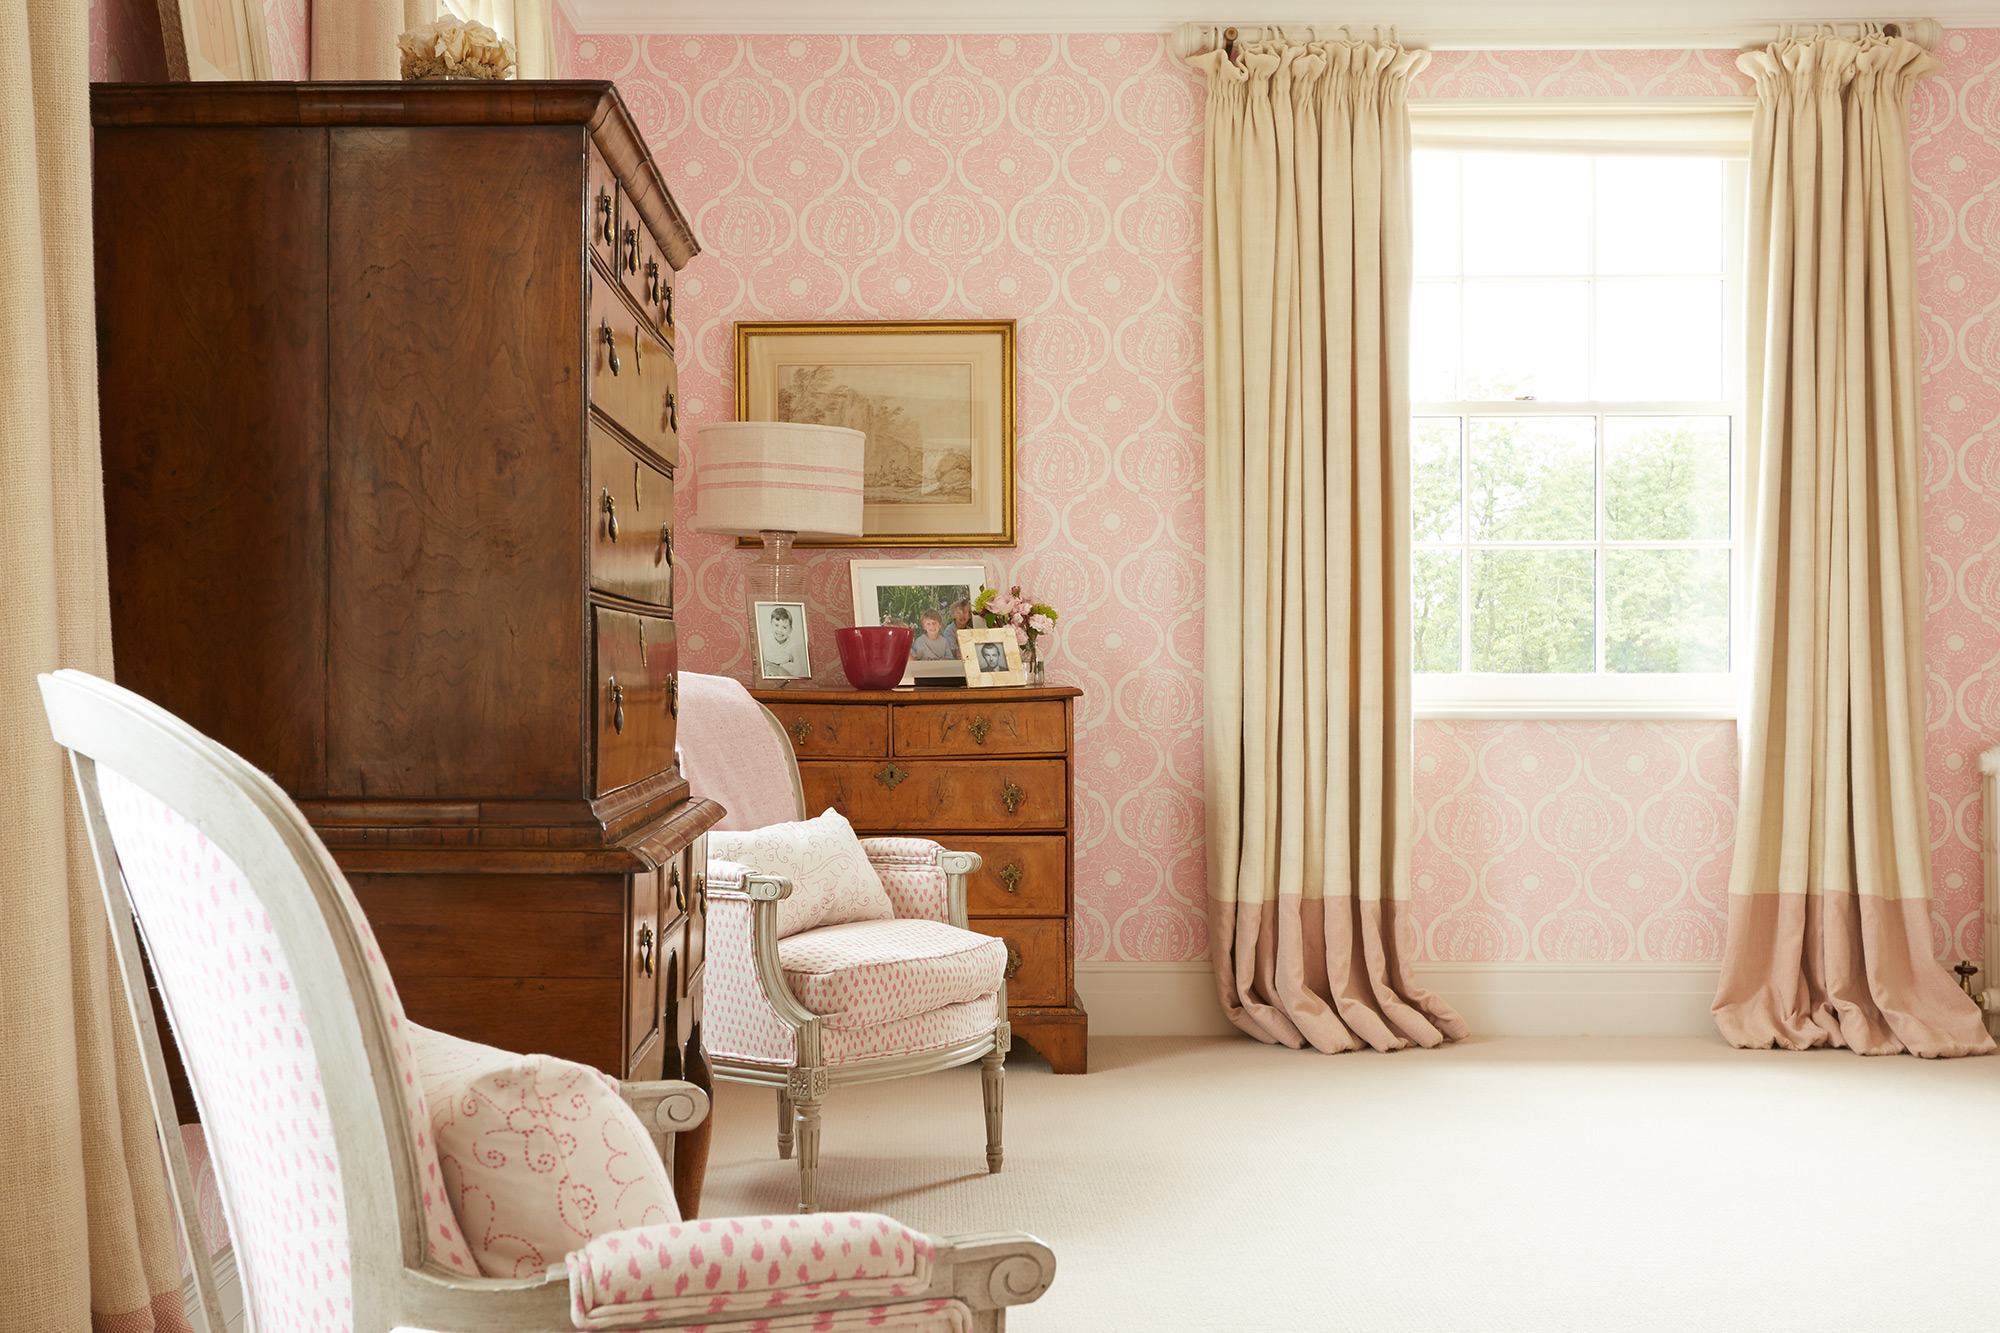 Bedroom deatil – interior design by Eadie & Crole